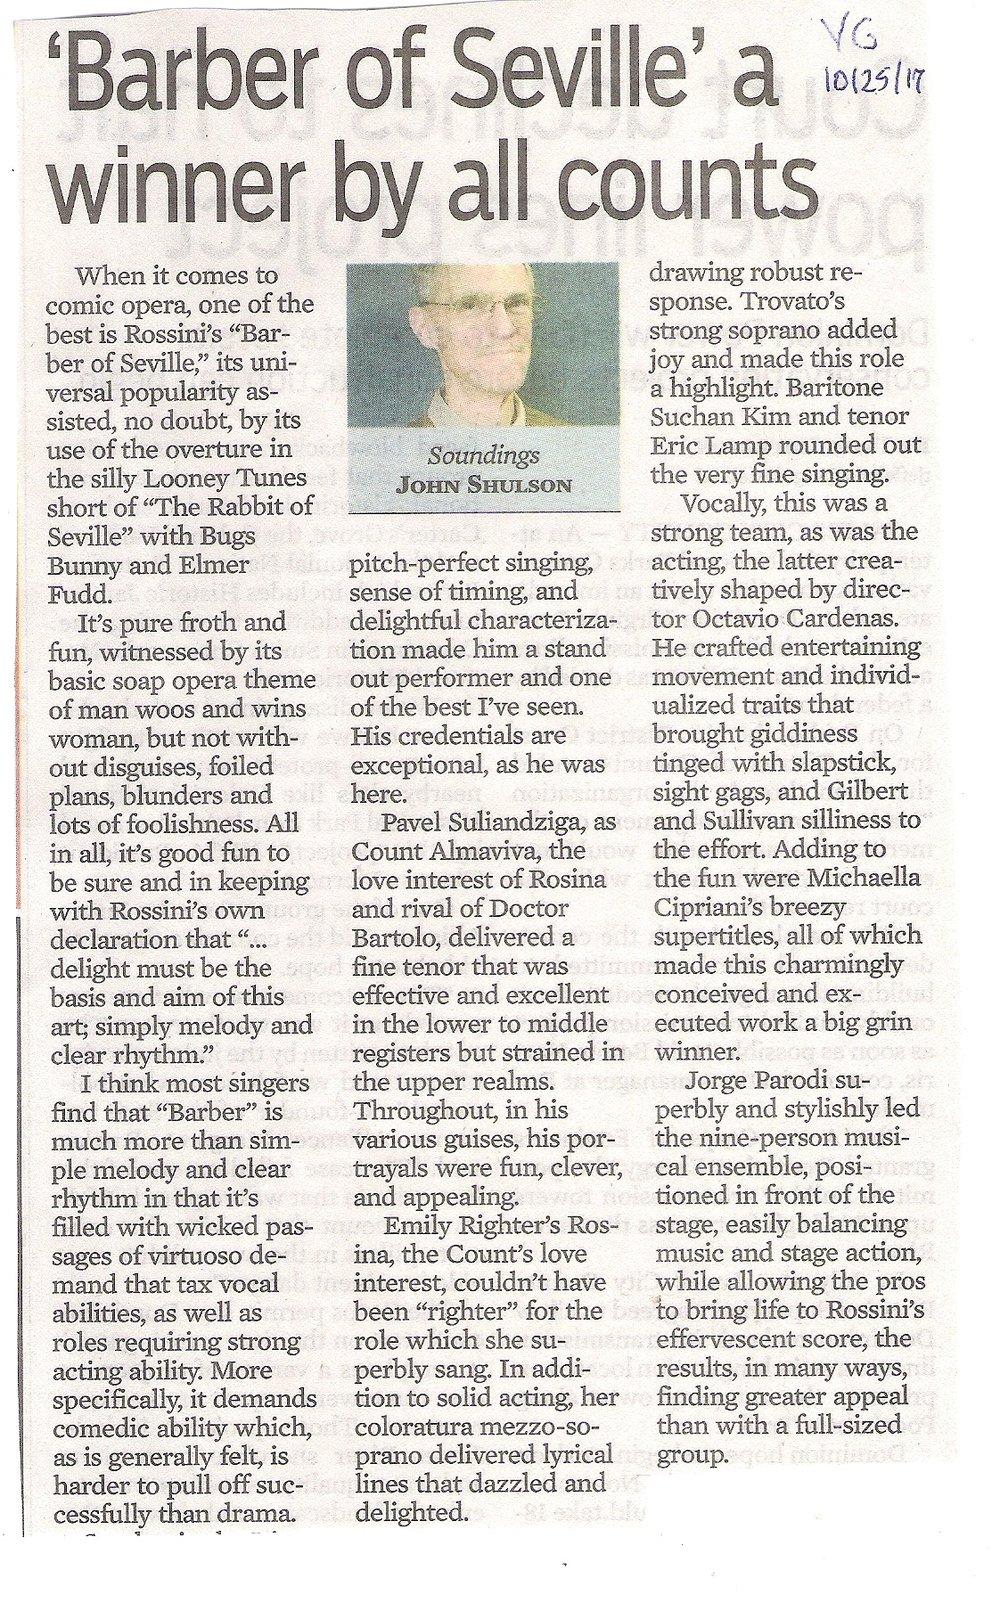 Va Gazette Shulson Barber review 10-25-17 p1.jpg